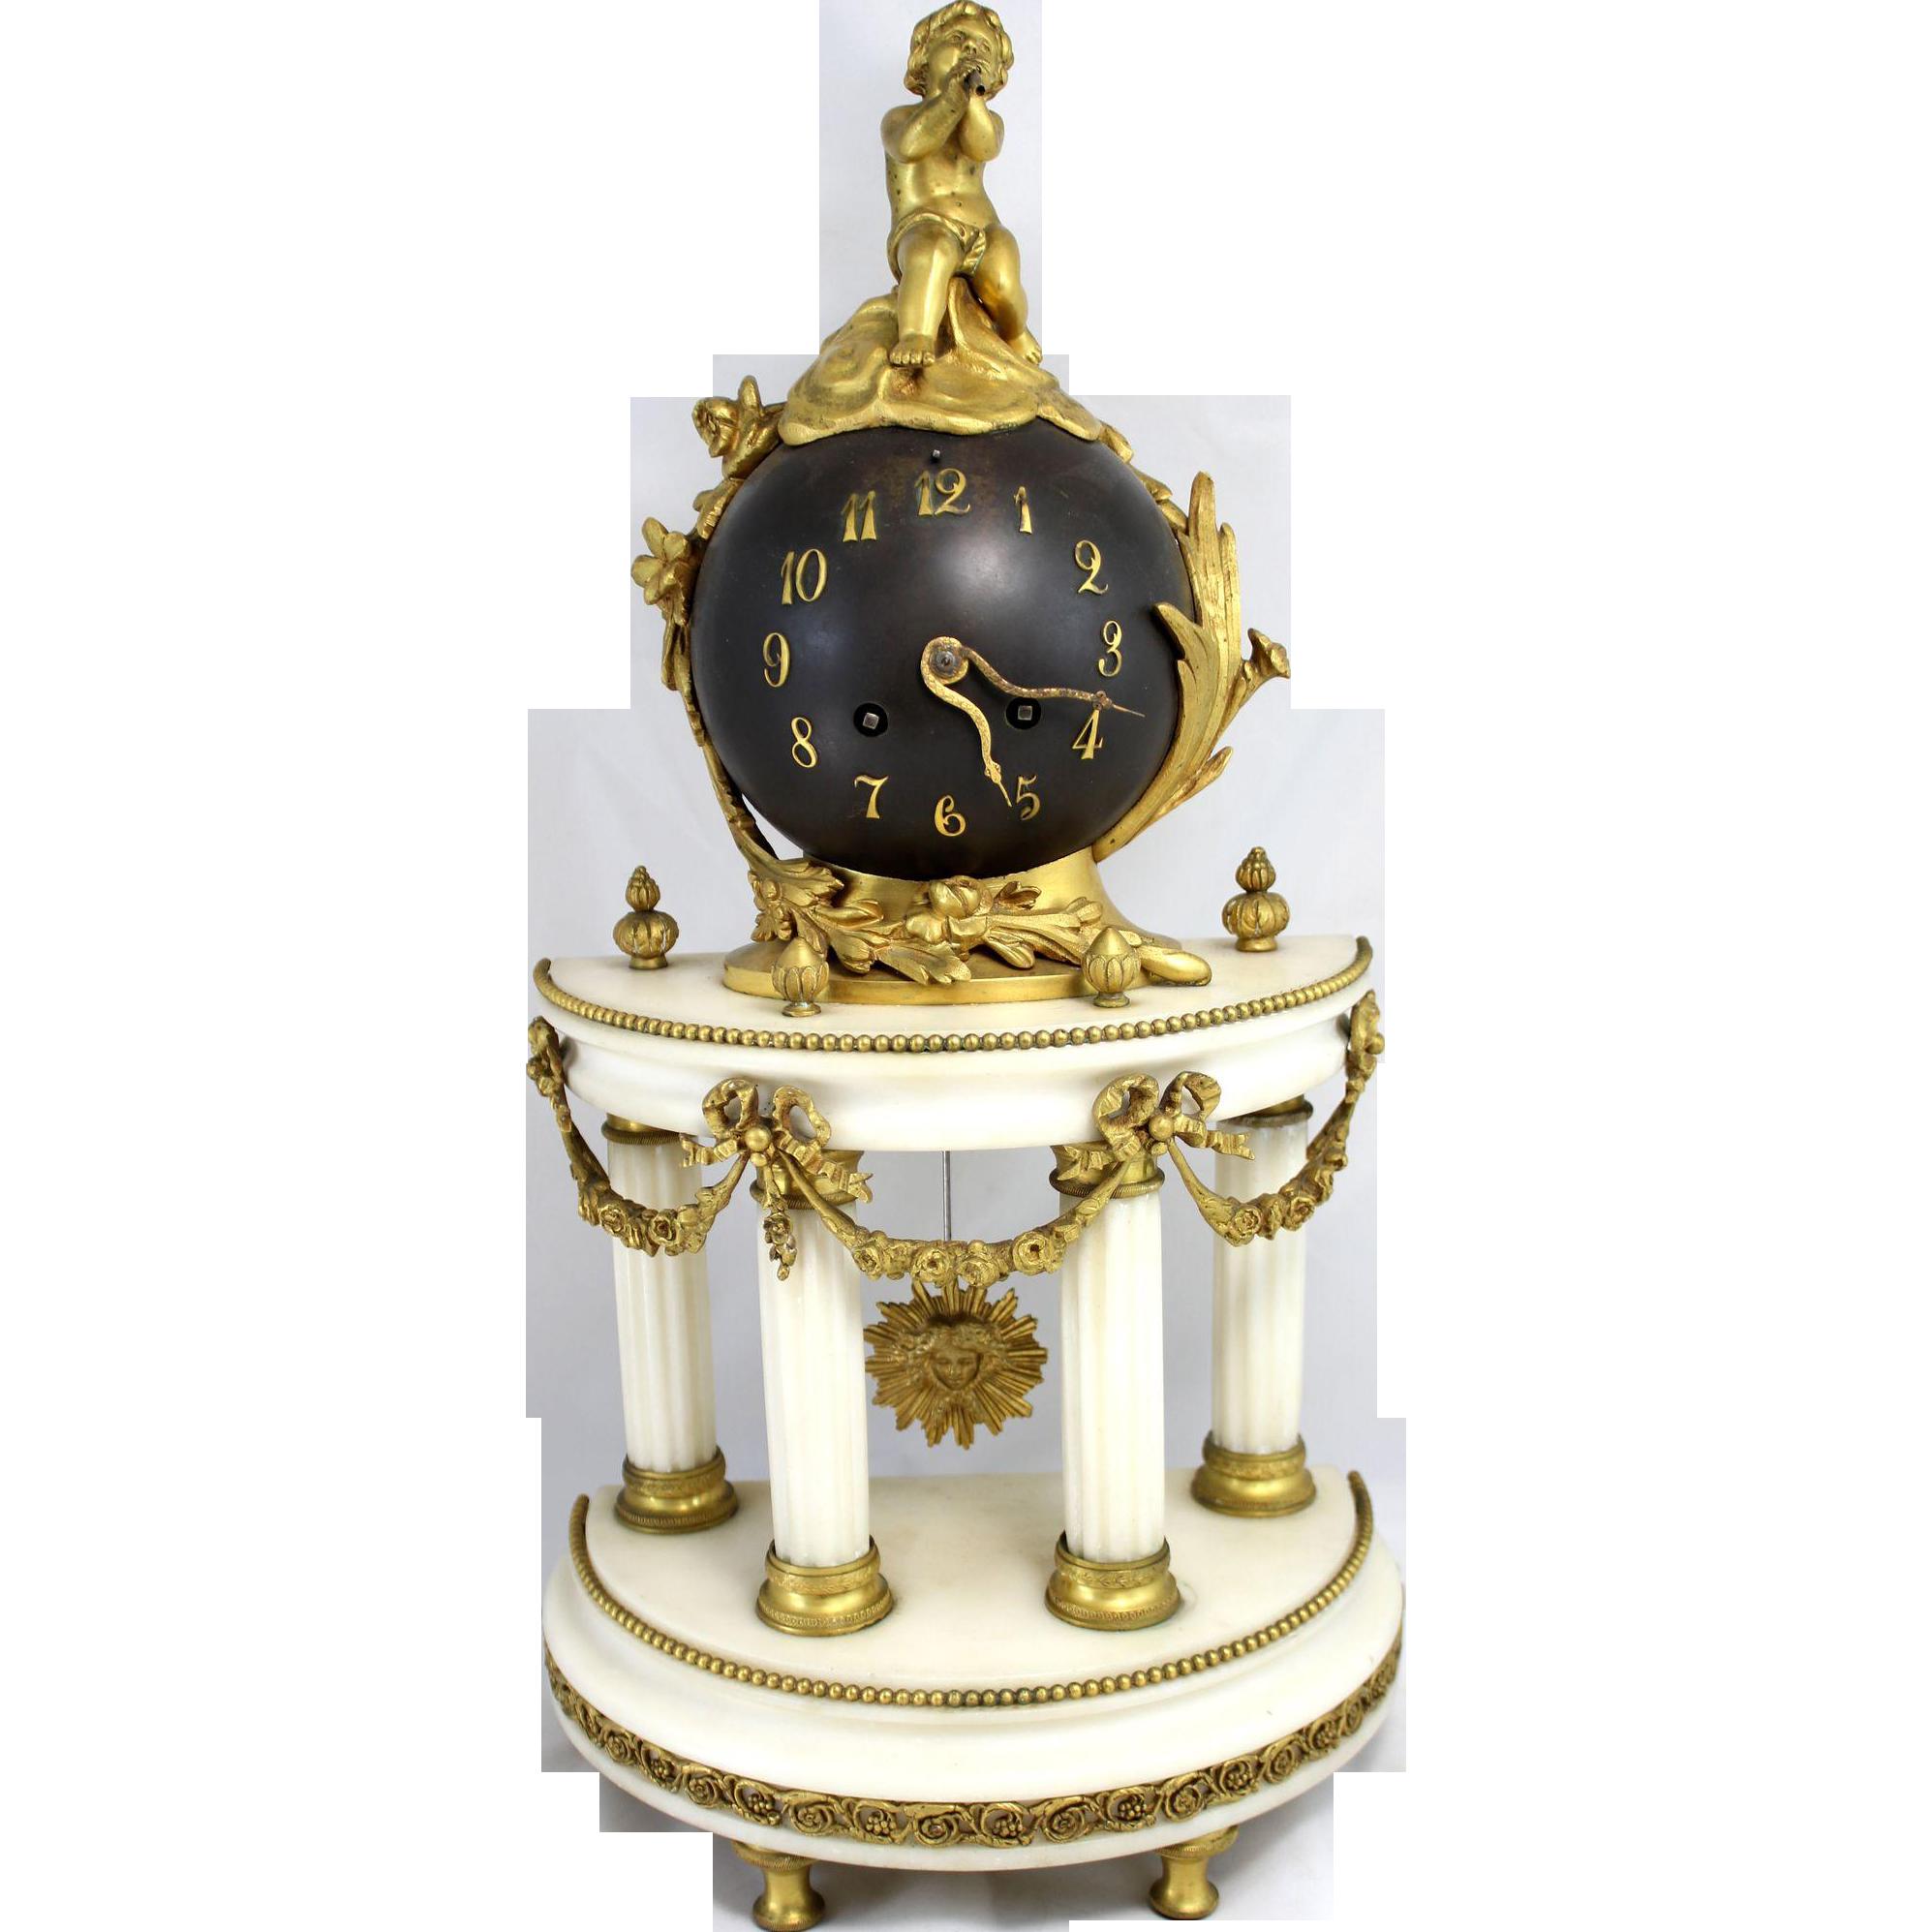 19th Century French Bronze Ormolu and Marble Figural Globe Mantel or Shelf Clock